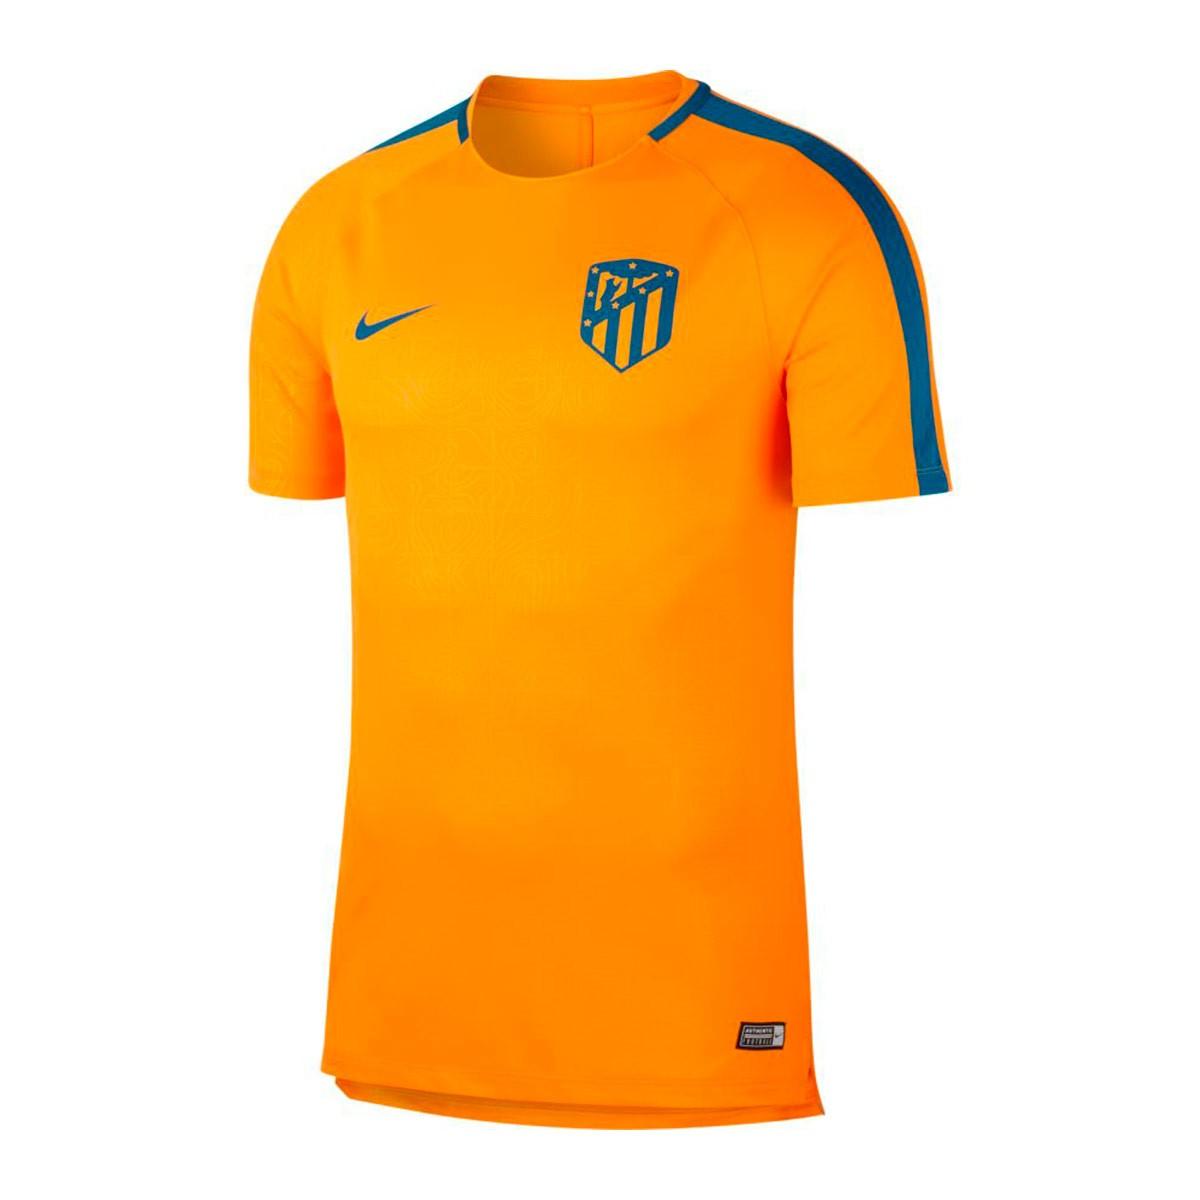 ... Camiseta Dry Atlético de Madrid Squad 2018-2019 Orange peel-Green  abyss. CATEGORY 7b0166fa80f